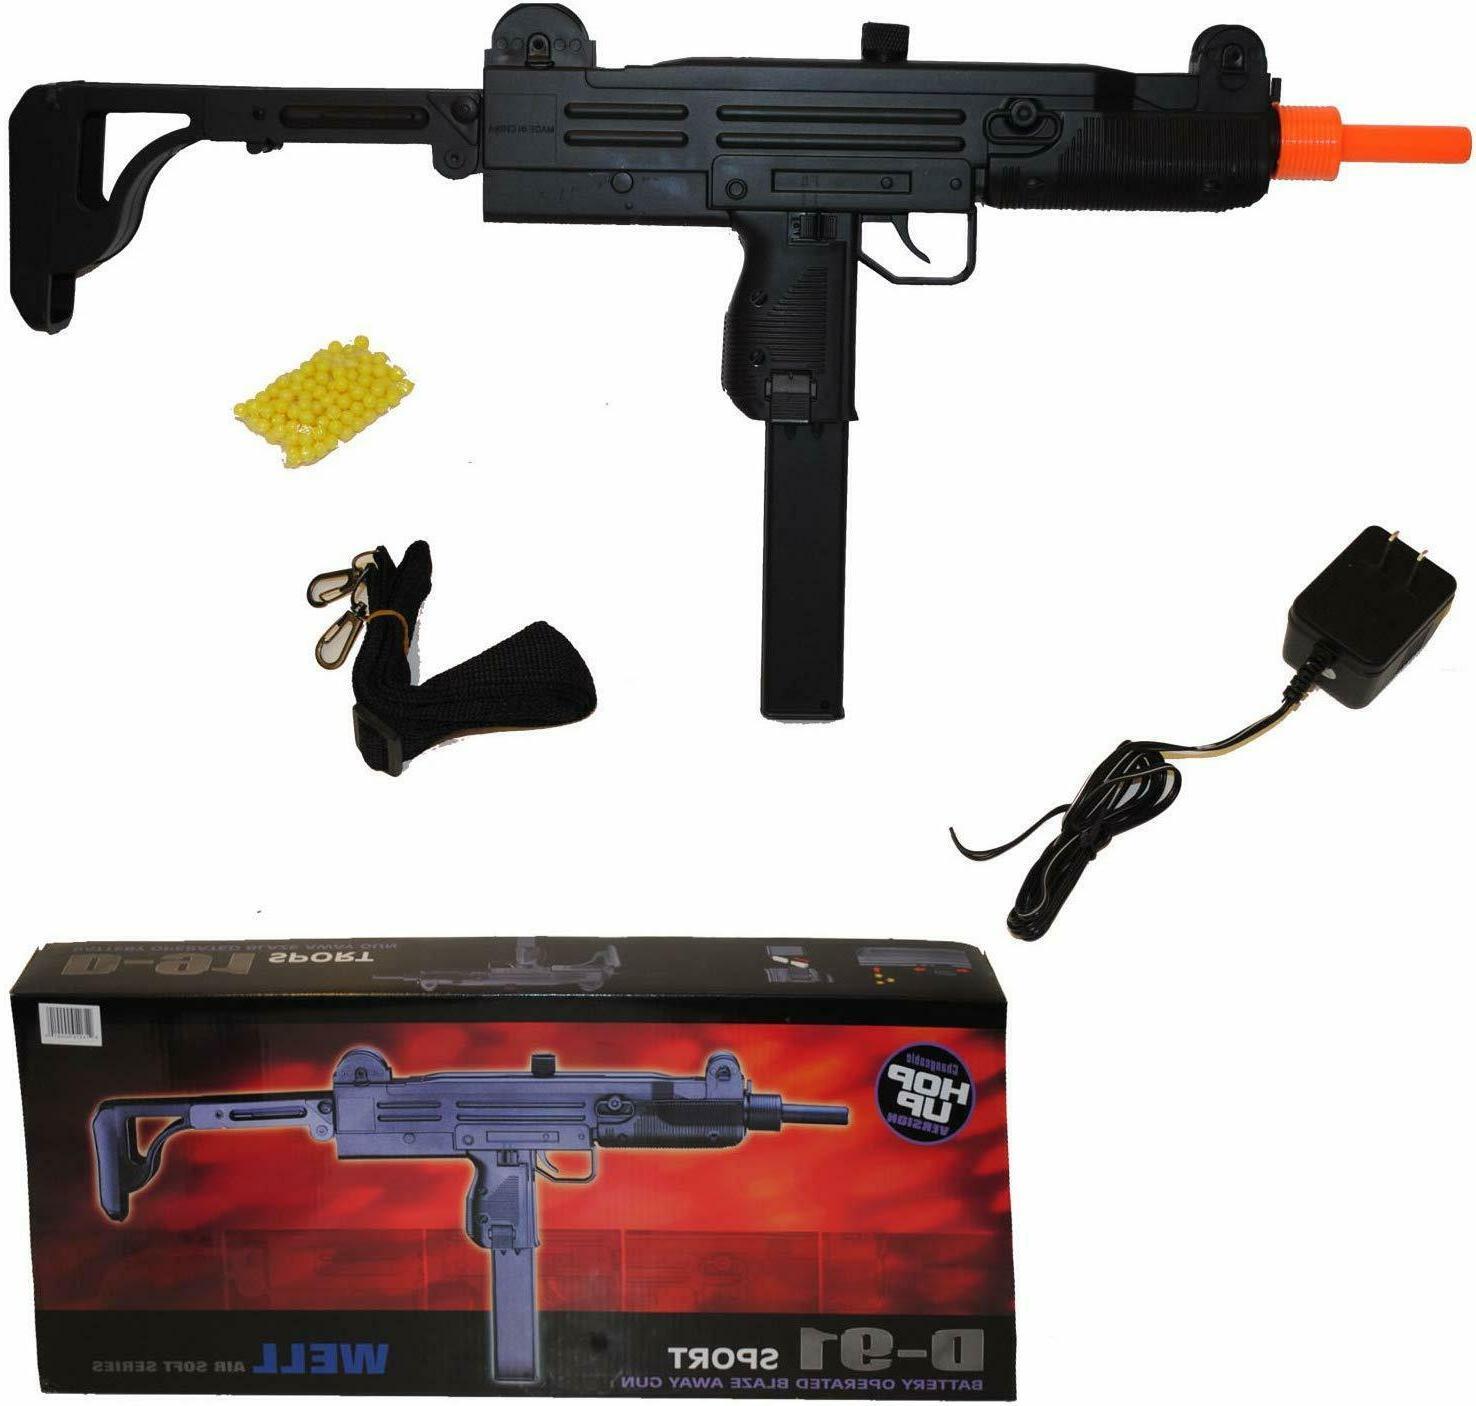 Well d95b Full Auto airsoft Gun with drum magazine, collapsi